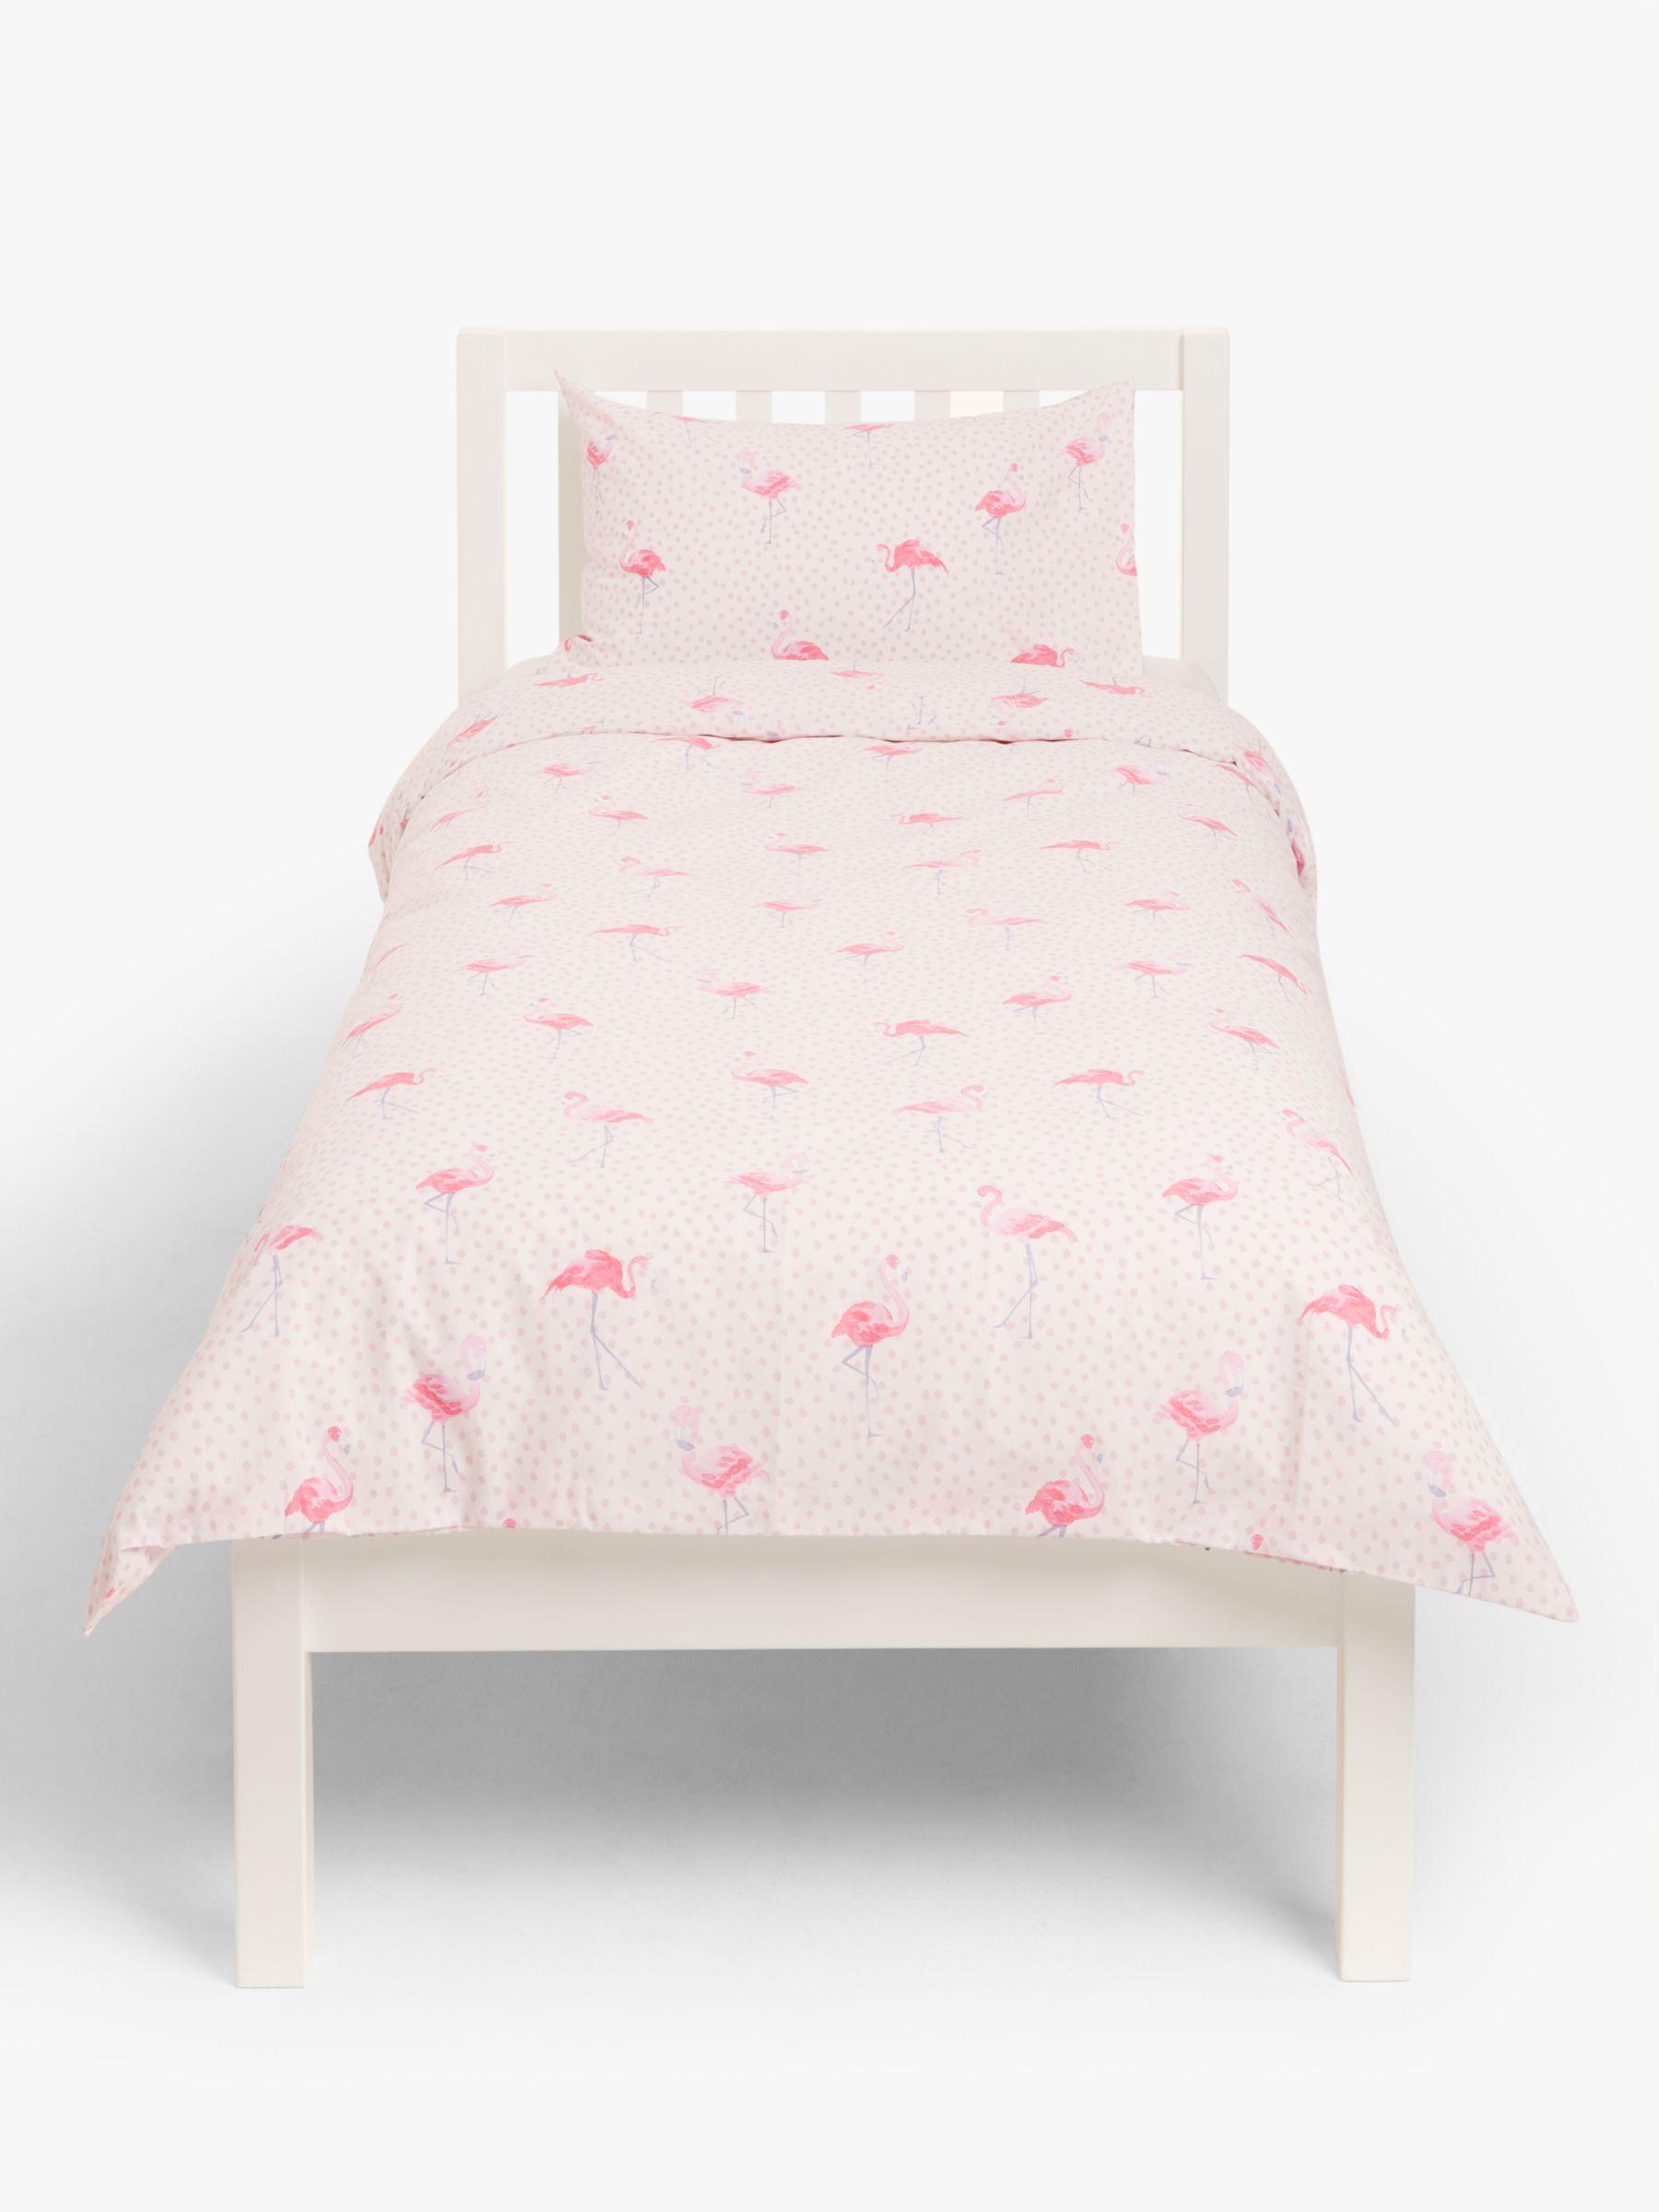 little home at John Lewis little home at John Lewis Phoebe Flamingo Duvet Cover and Pillowcase Set, Single, Pink